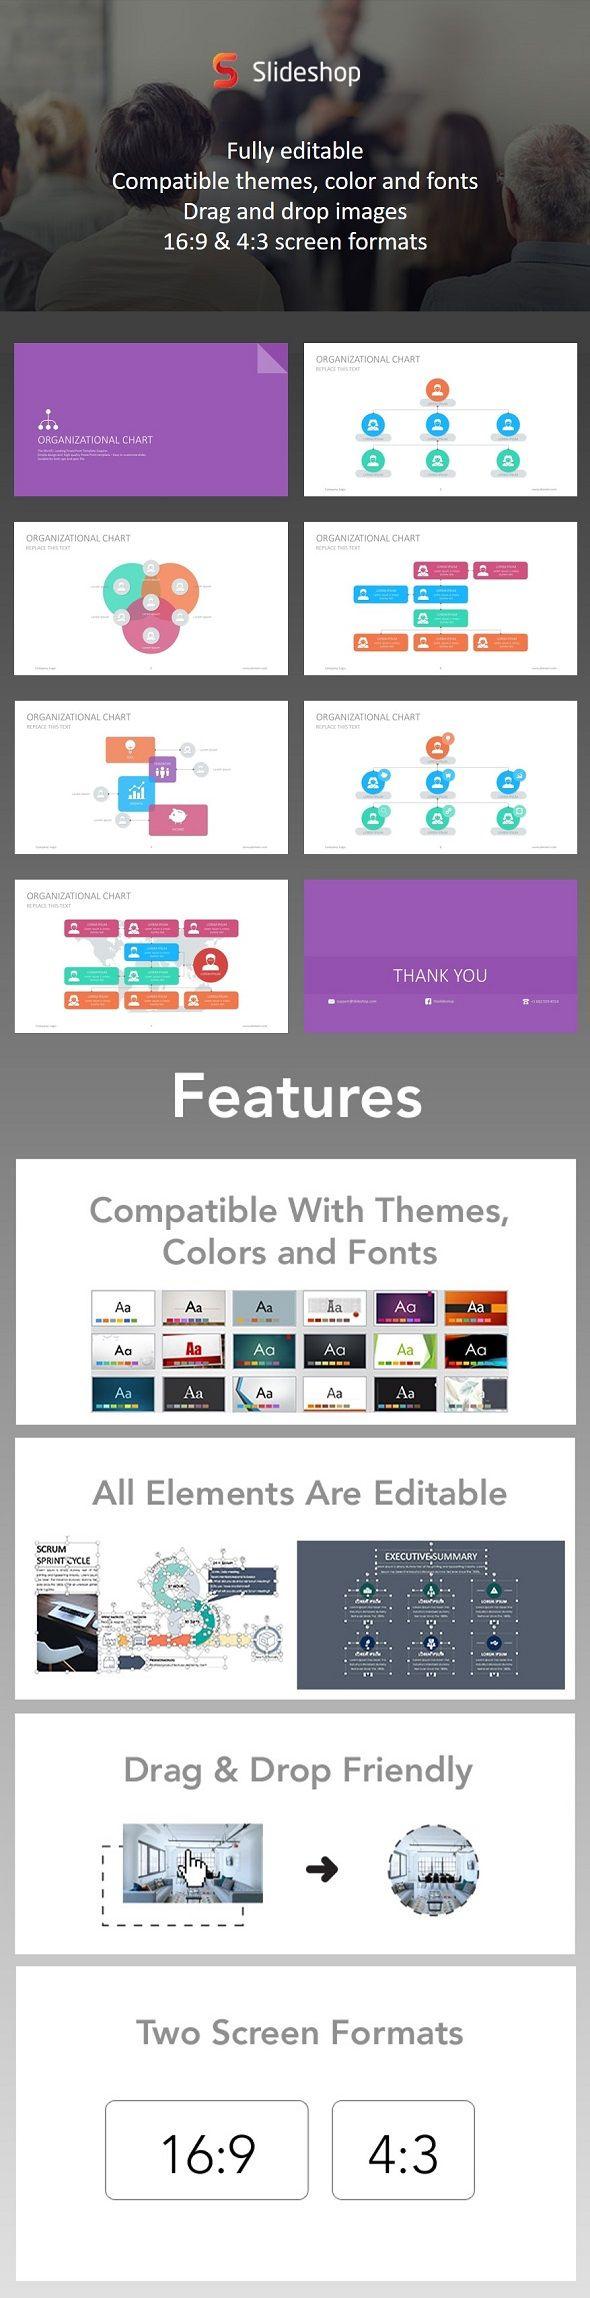 organizational chart google style | presentation templates, font, Presentation templates